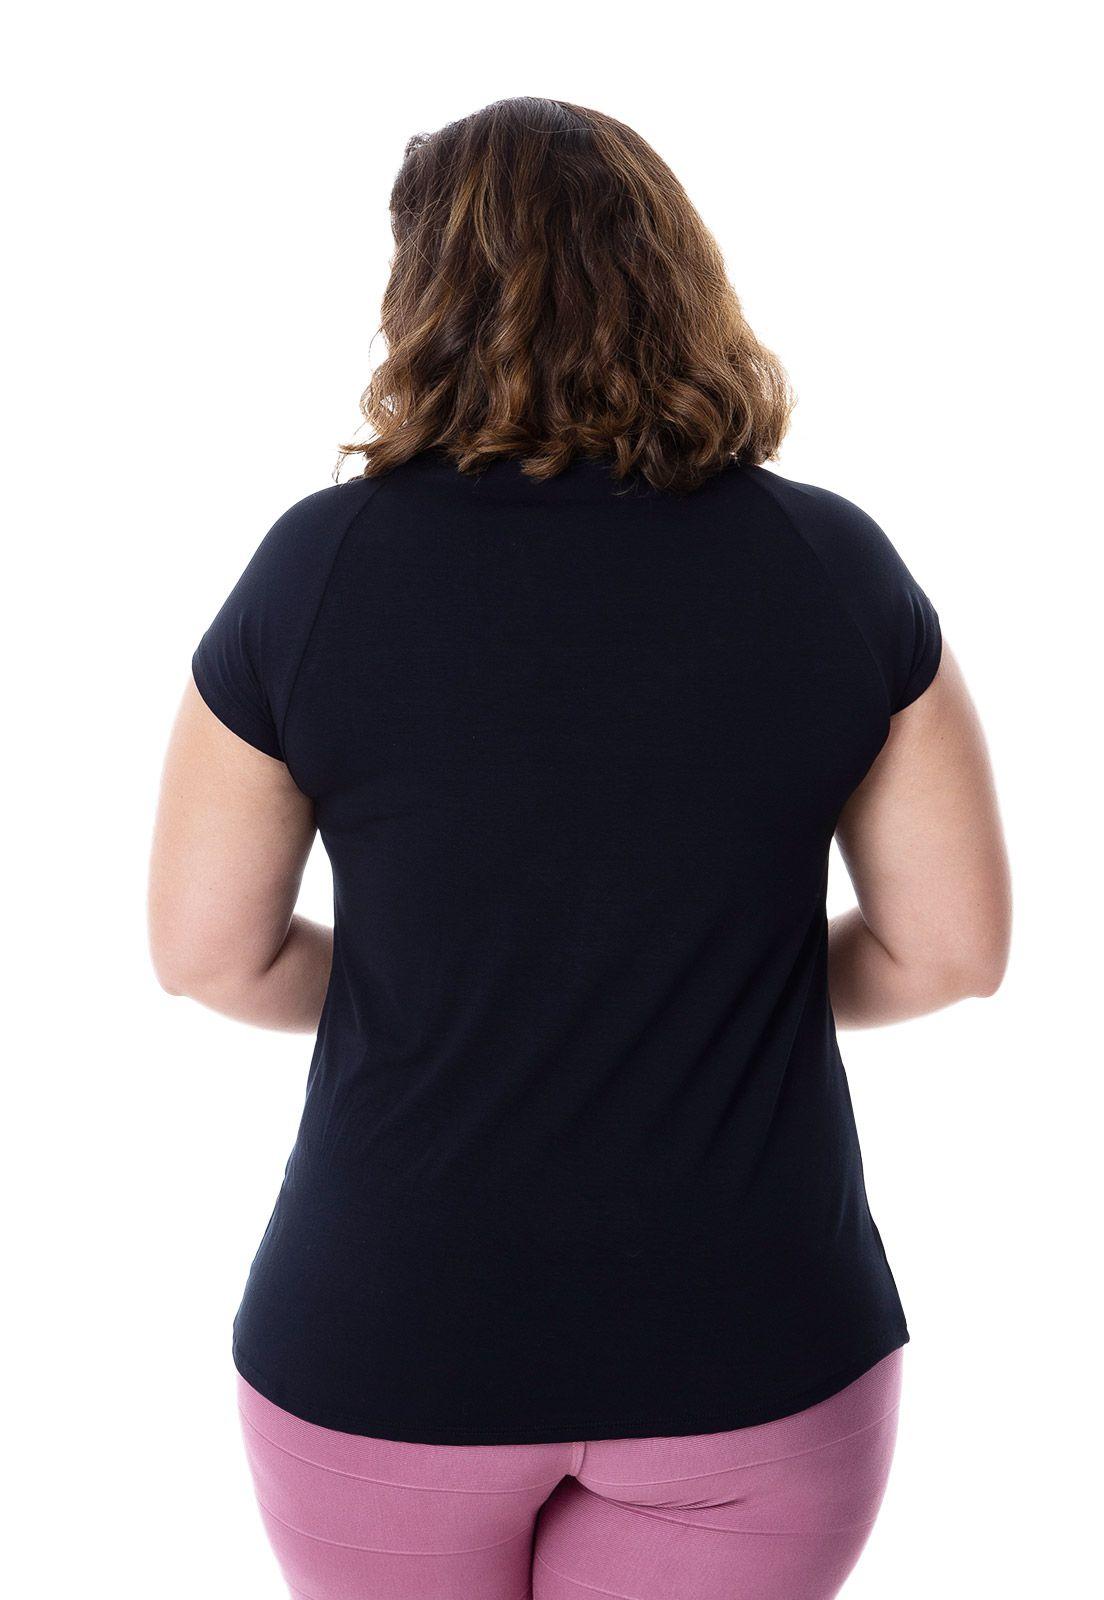 Blusa plus size manga curta com tachas preta